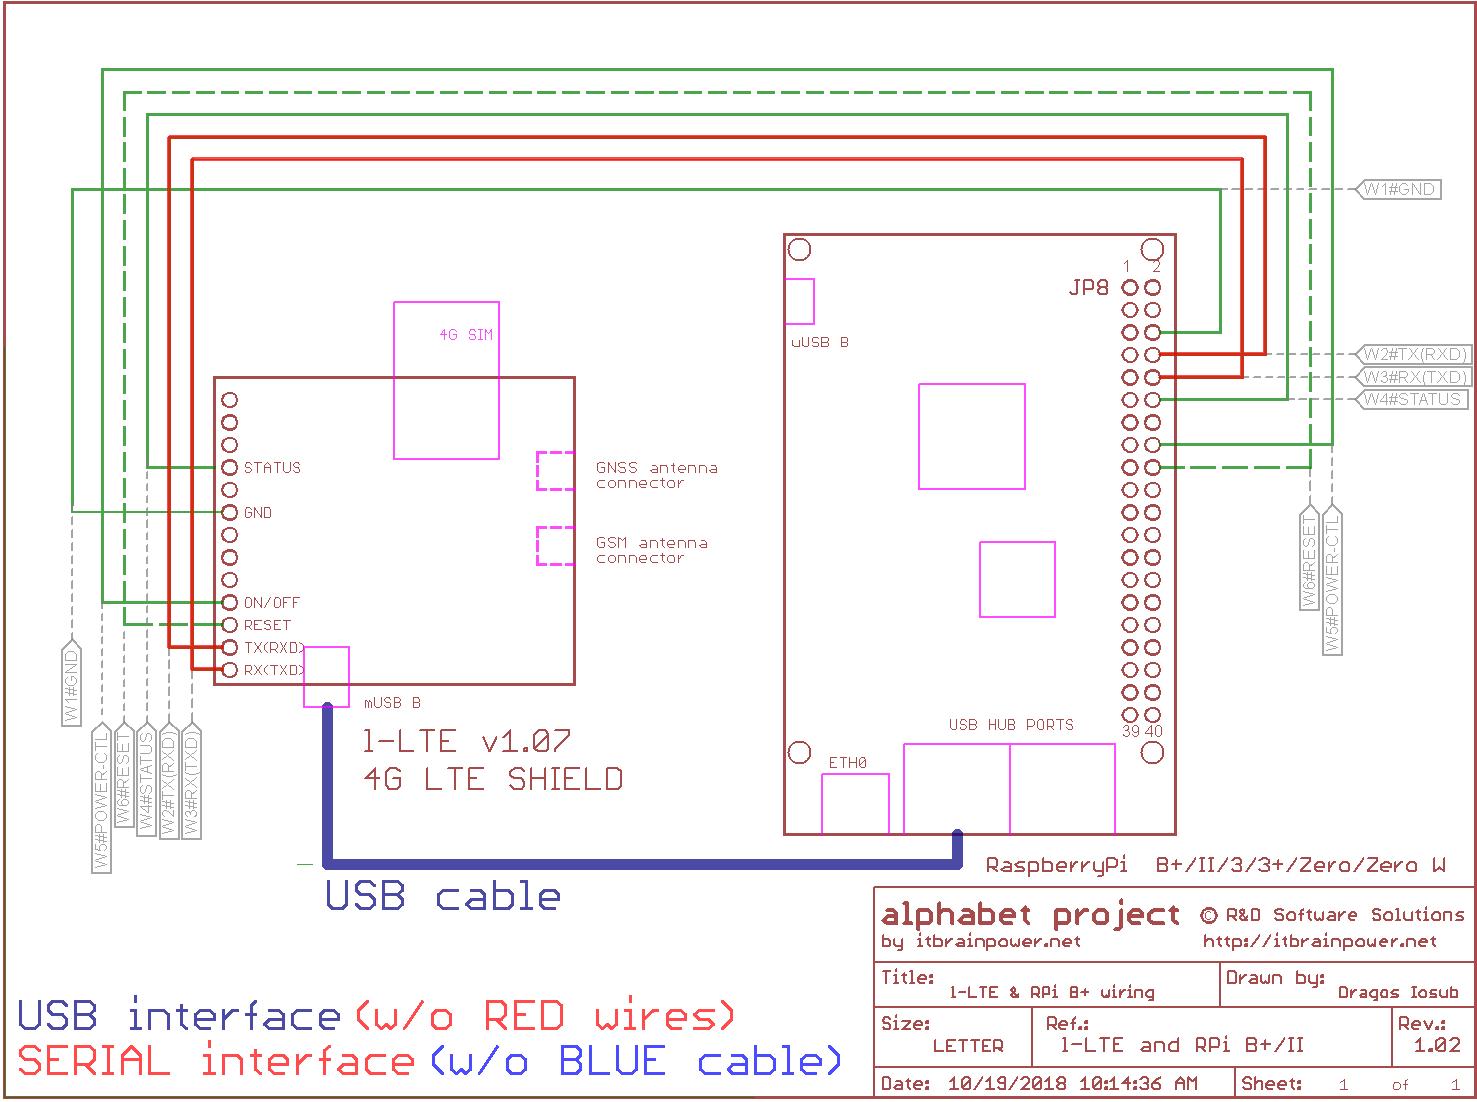 kick-start for l-LTE 1 07 by itbrainpower net